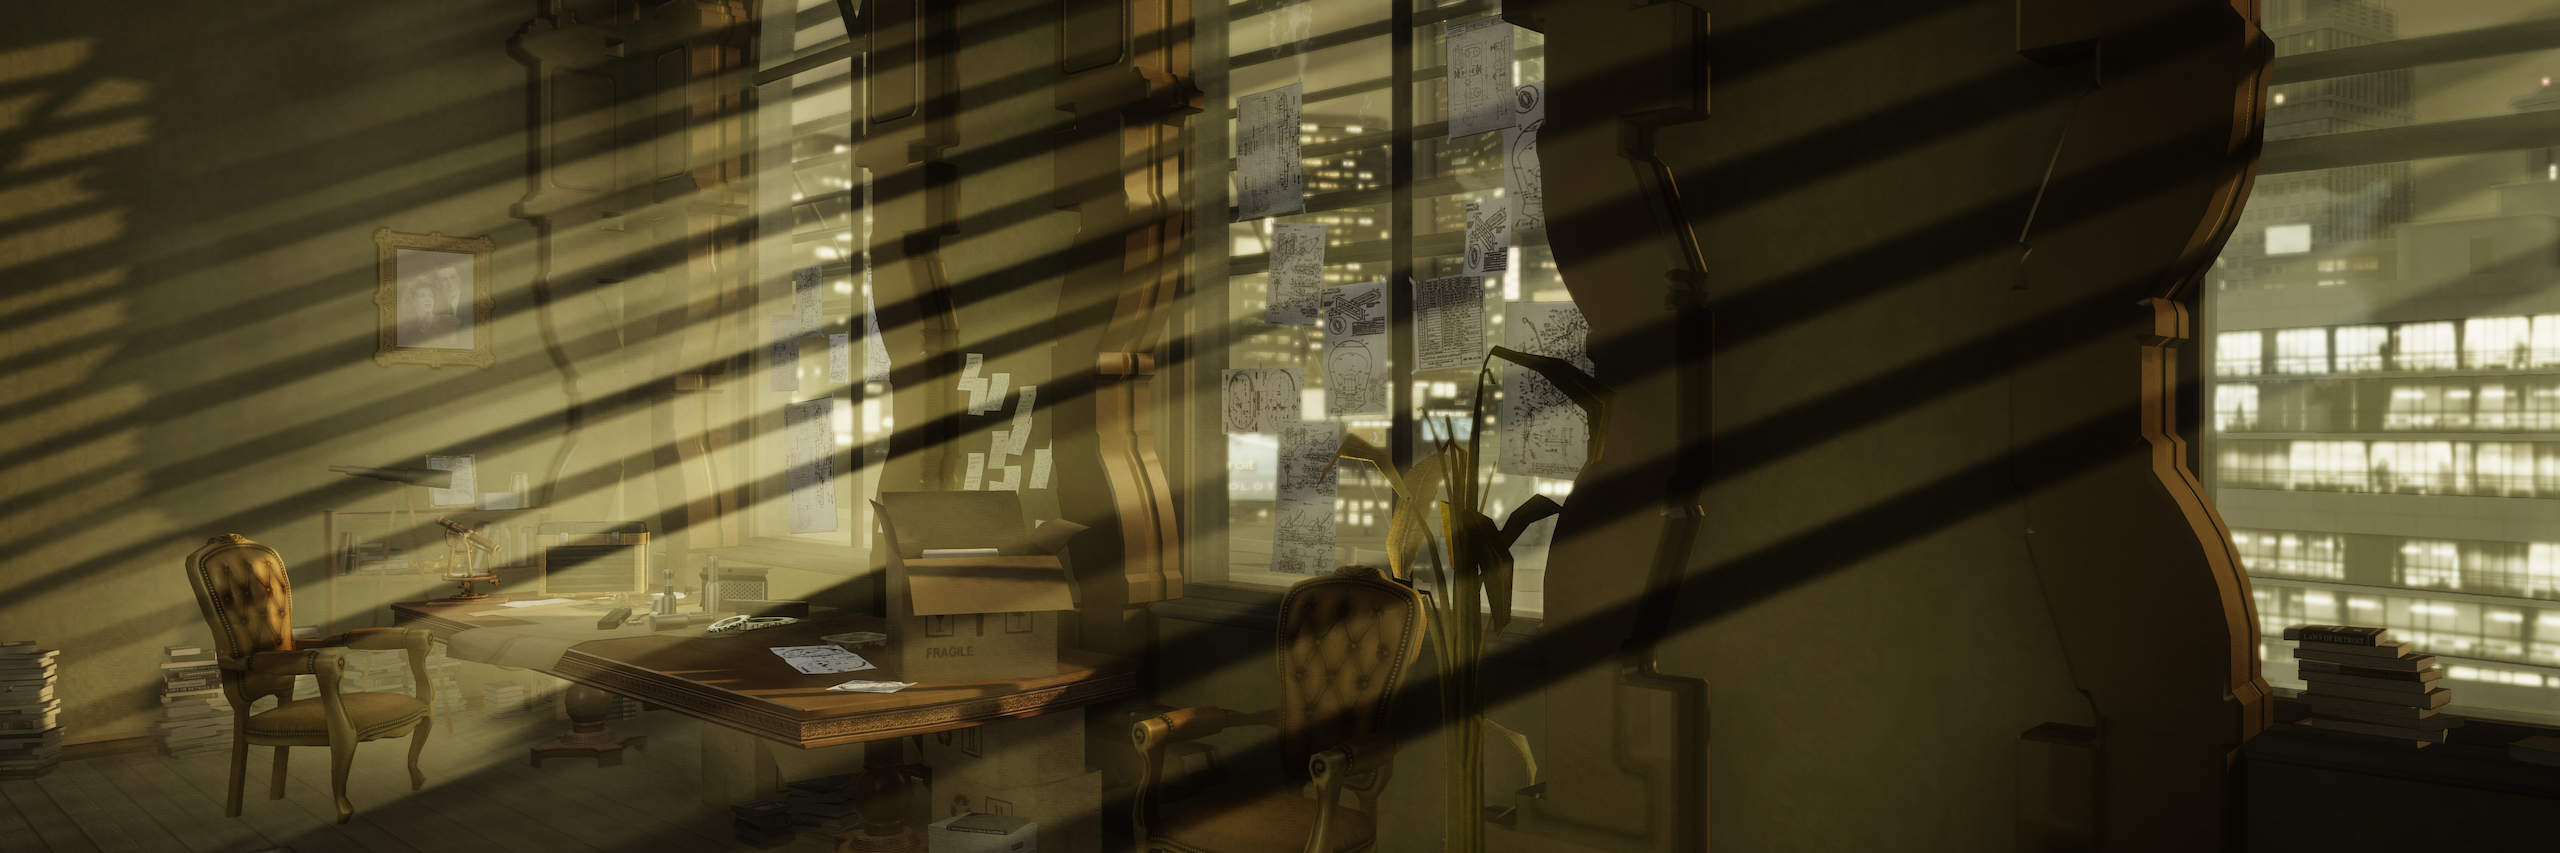 electricrelaxationalt.png - Deus Ex: Human Revolution